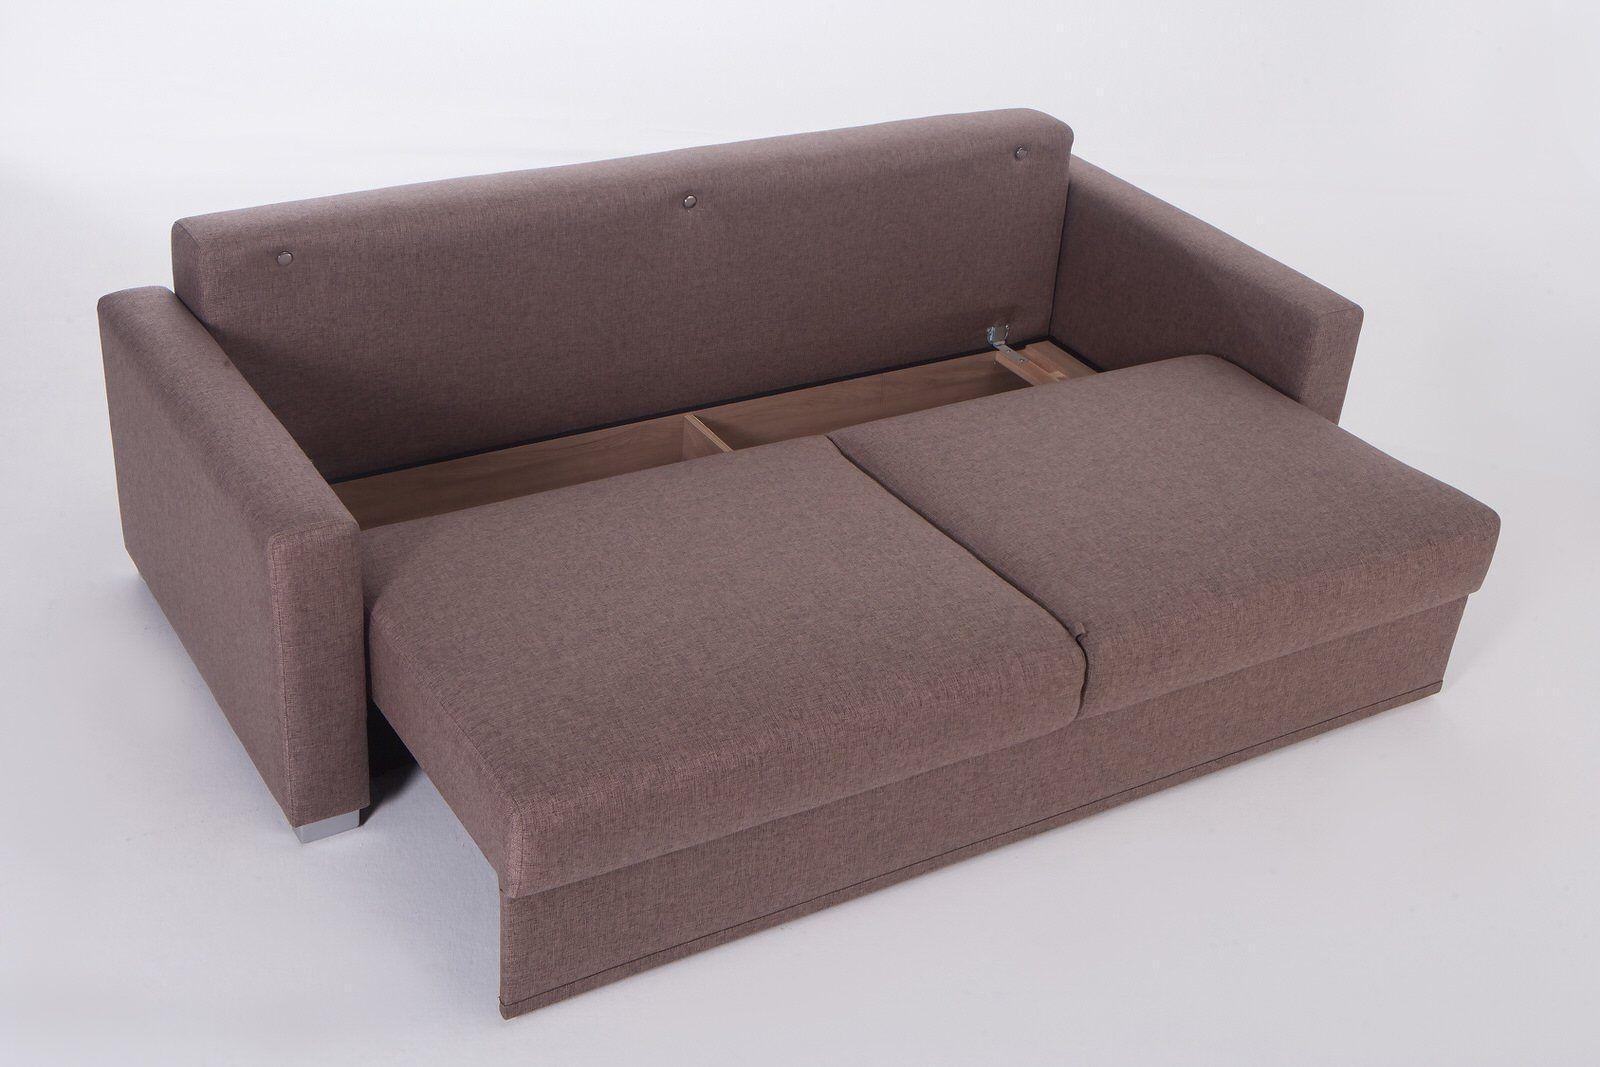 New convertible sofa unique convertible sofa about remodel home